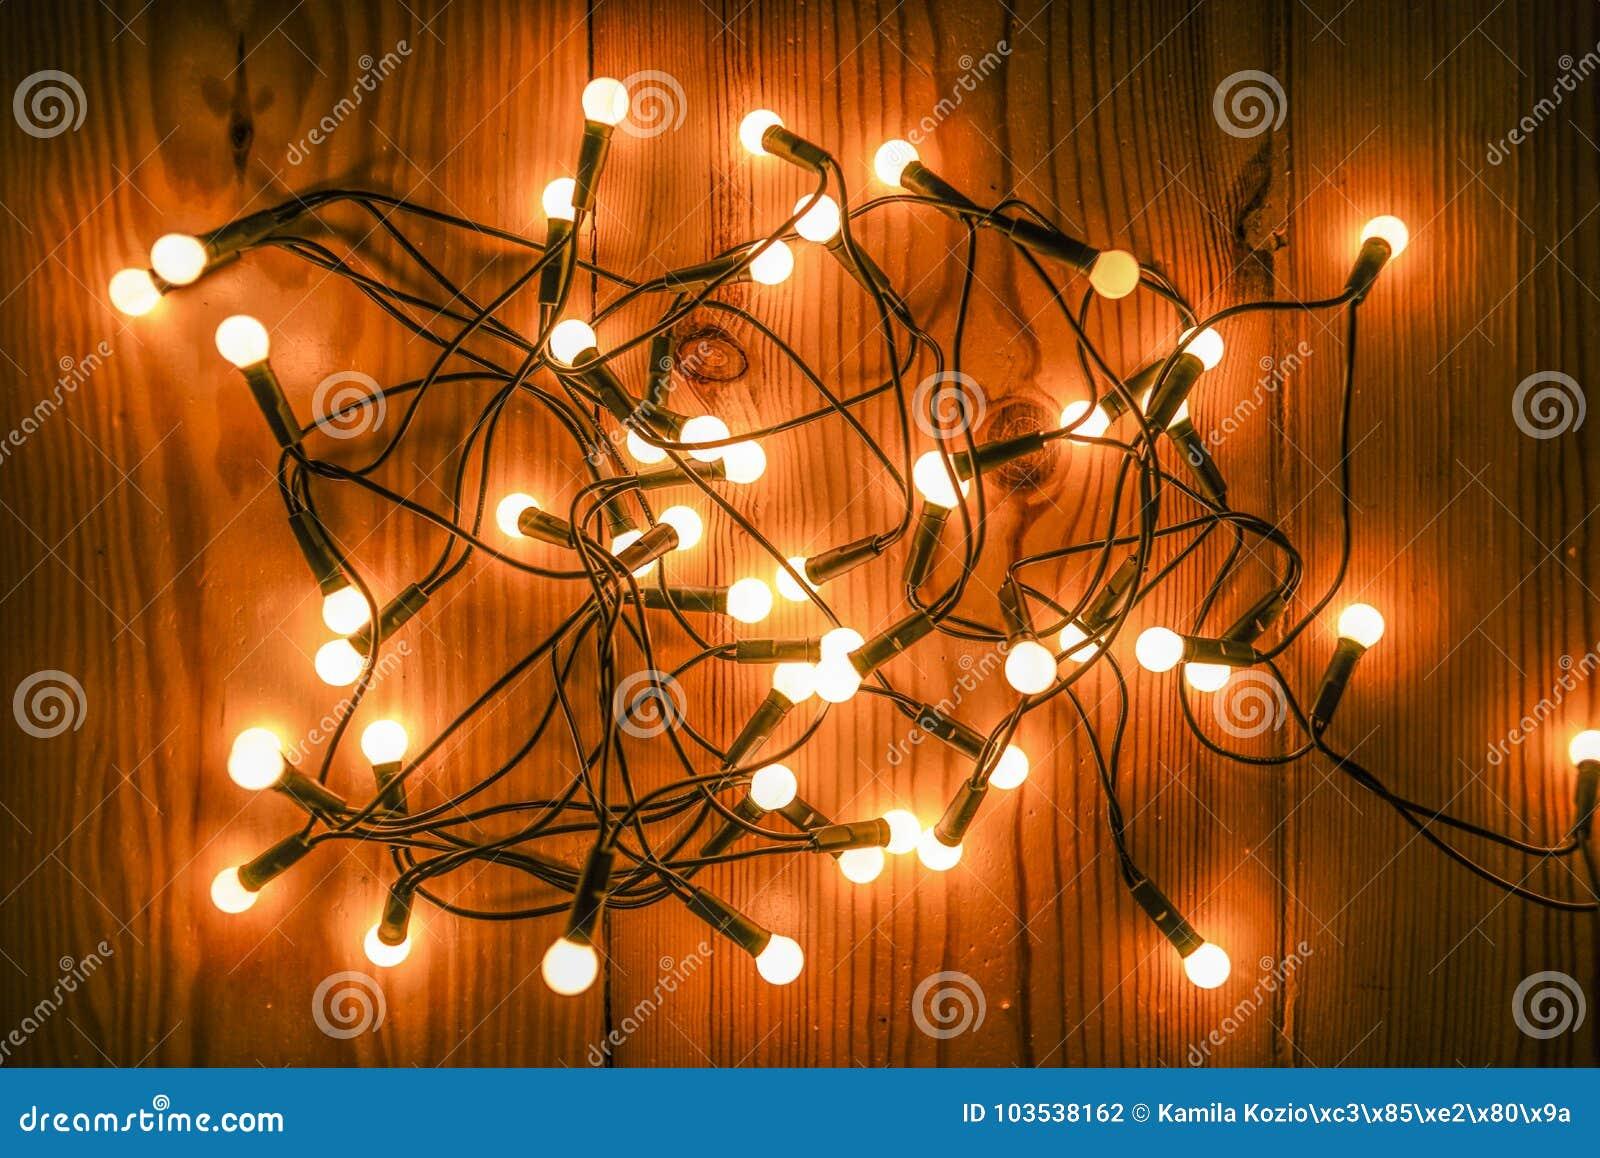 Glowing Christmas tree lights lying on a wooden floor